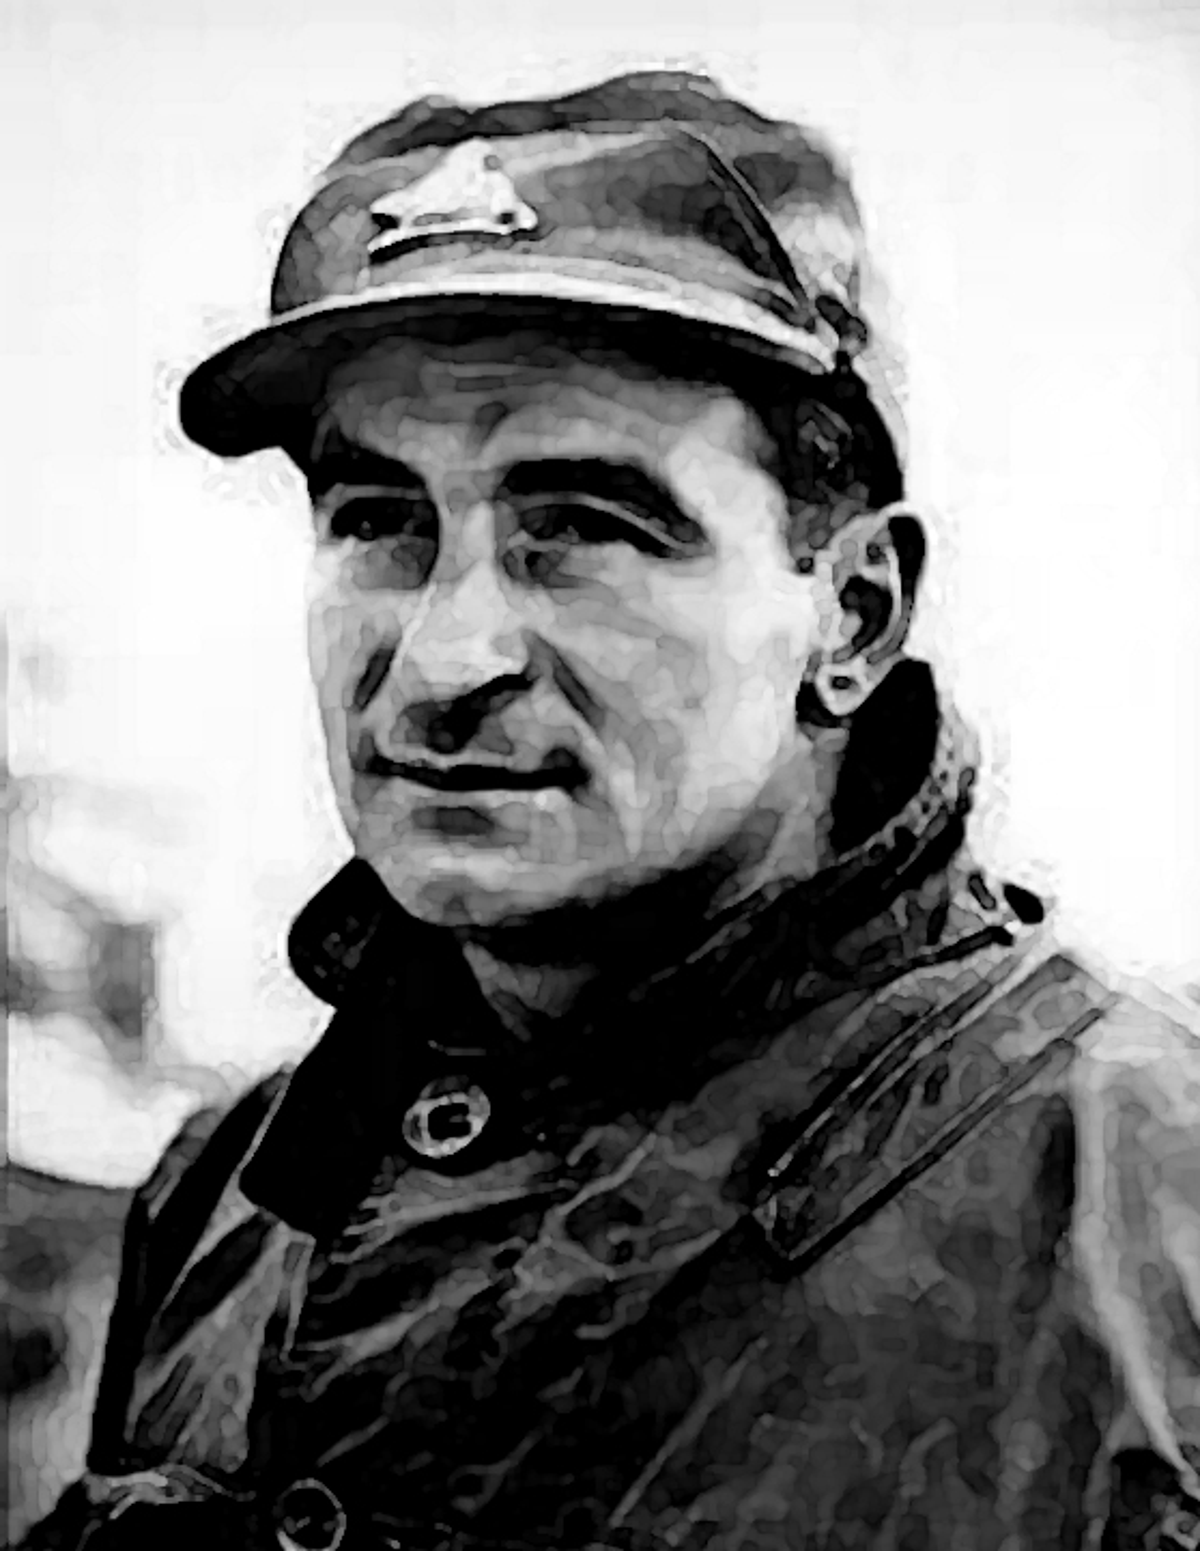 Corporal Léo Major